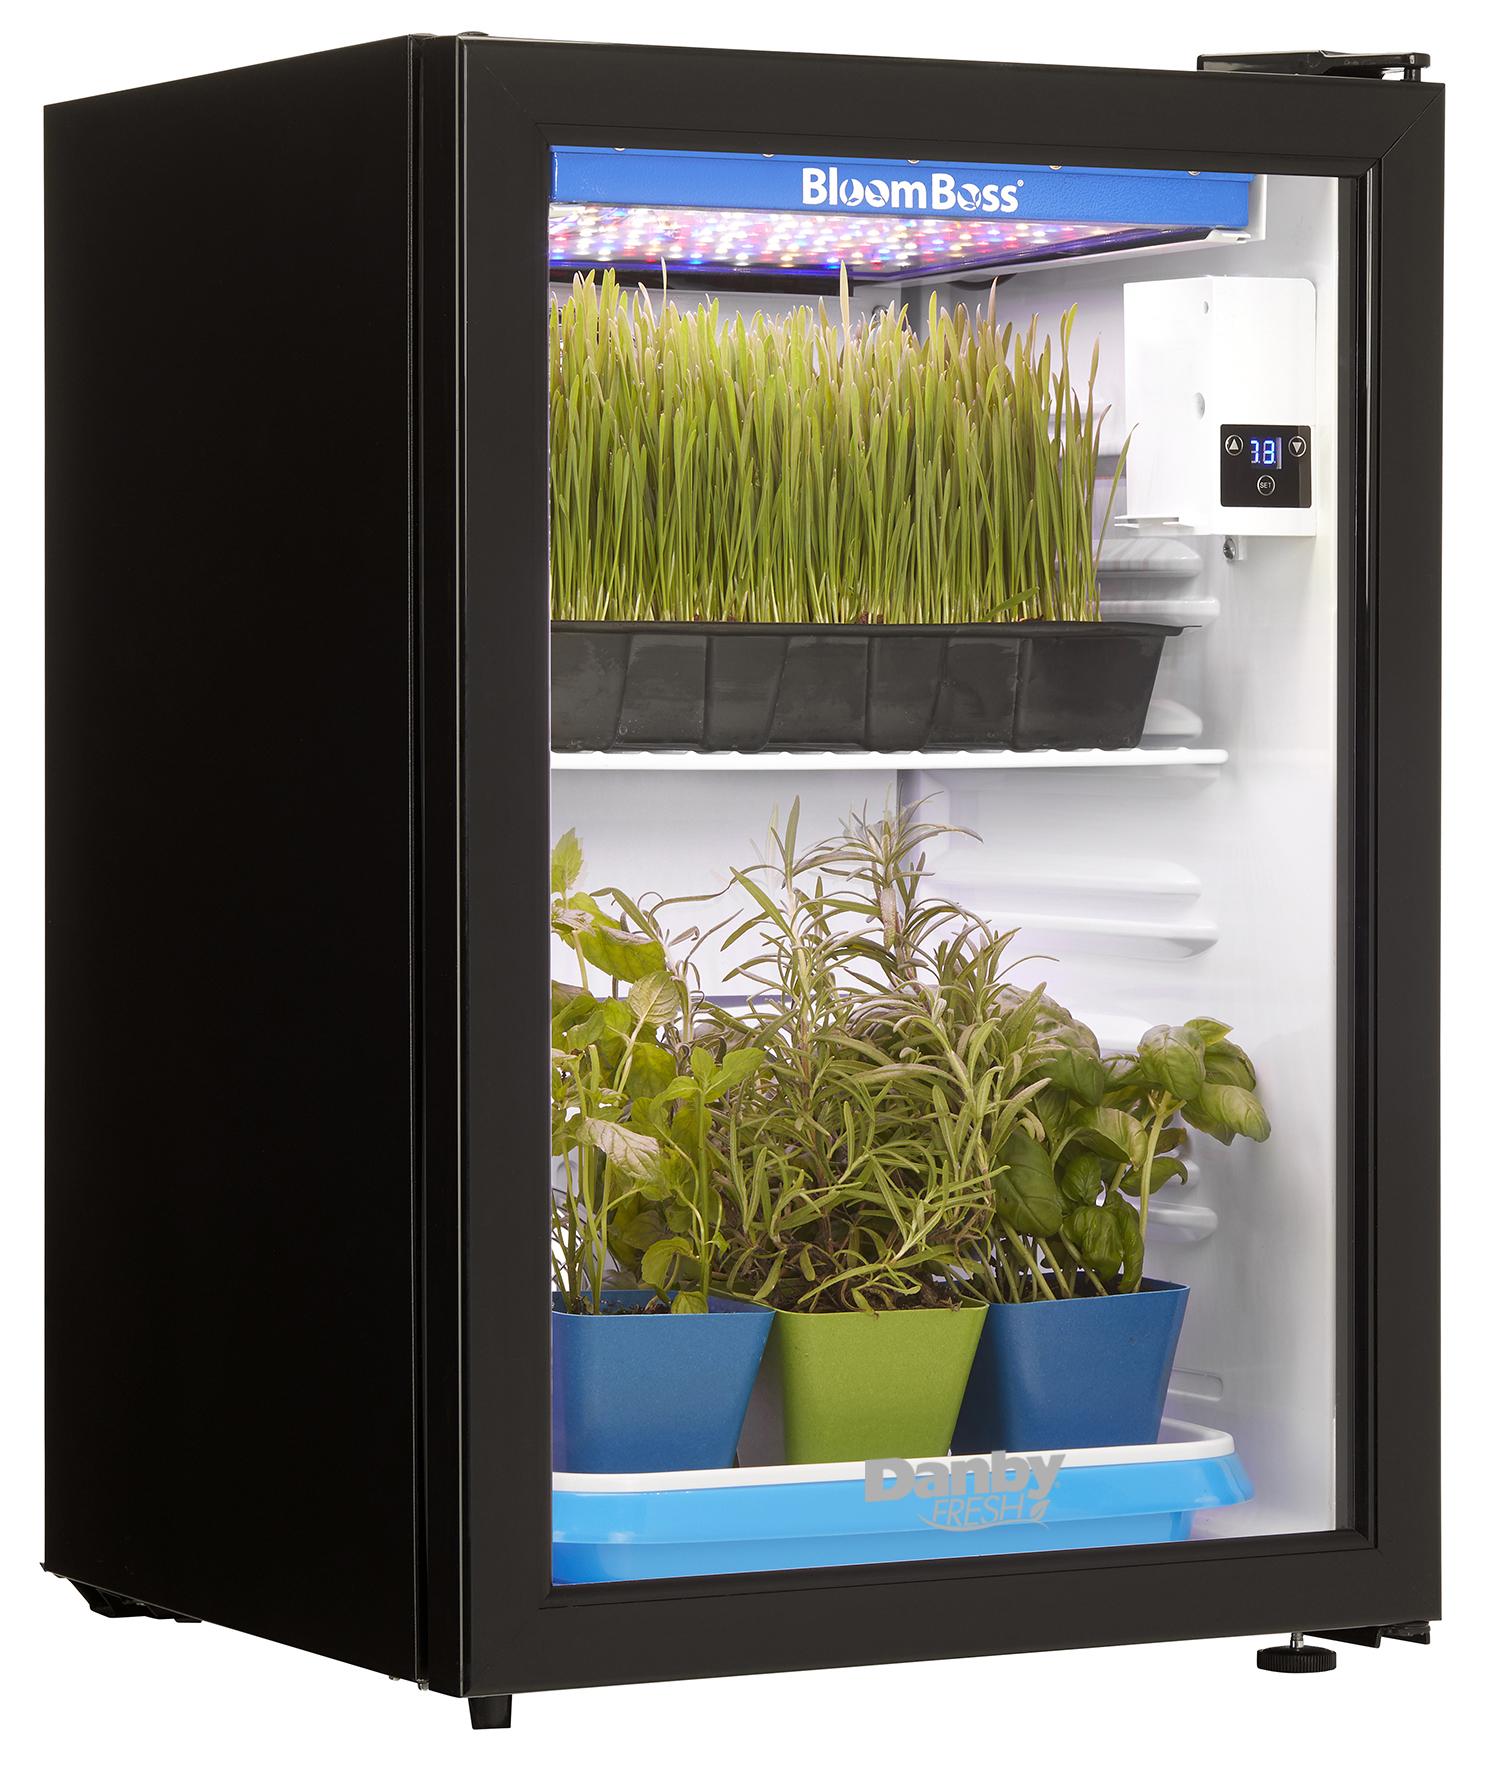 DFG26A1B Danby Fresh 2 6 cu ft Home Herb Grower